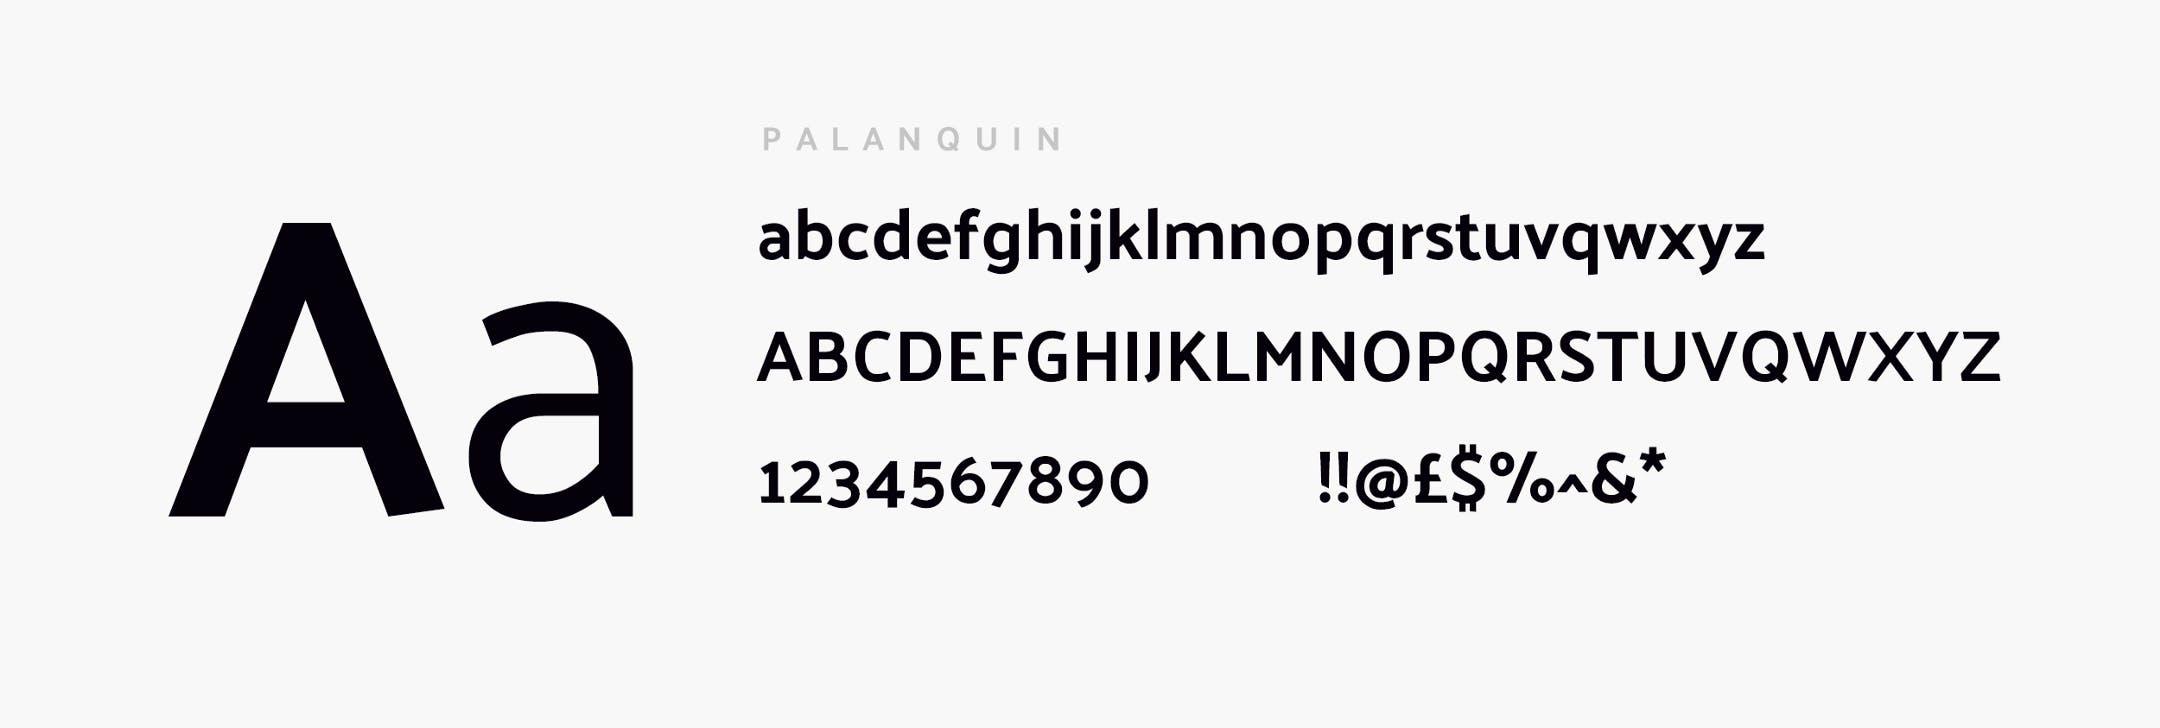 Palaquin typography demo